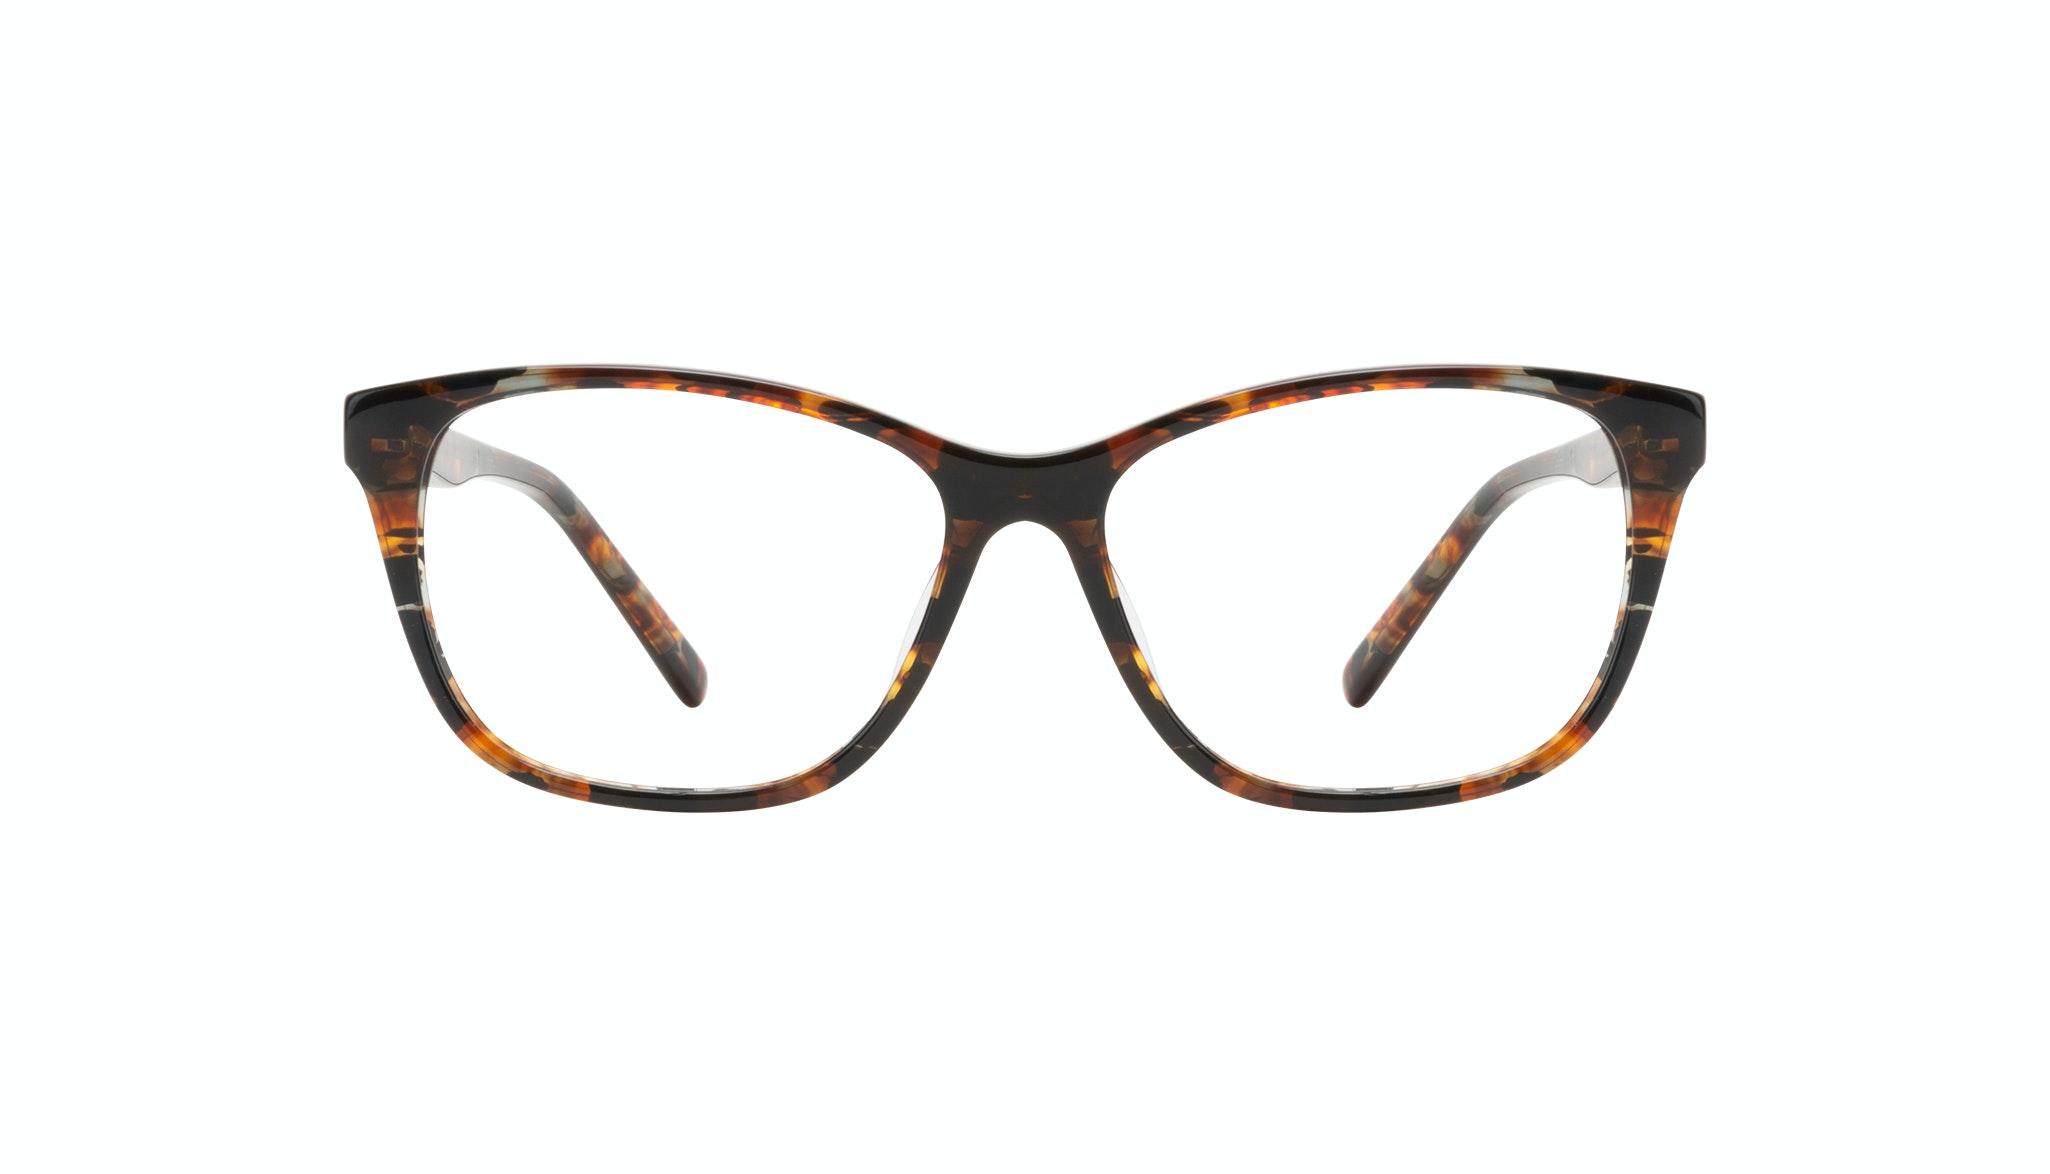 Affordable Fashion Glasses Cat Eye Eyeglasses Women Myrtle Petite Mahogany Front